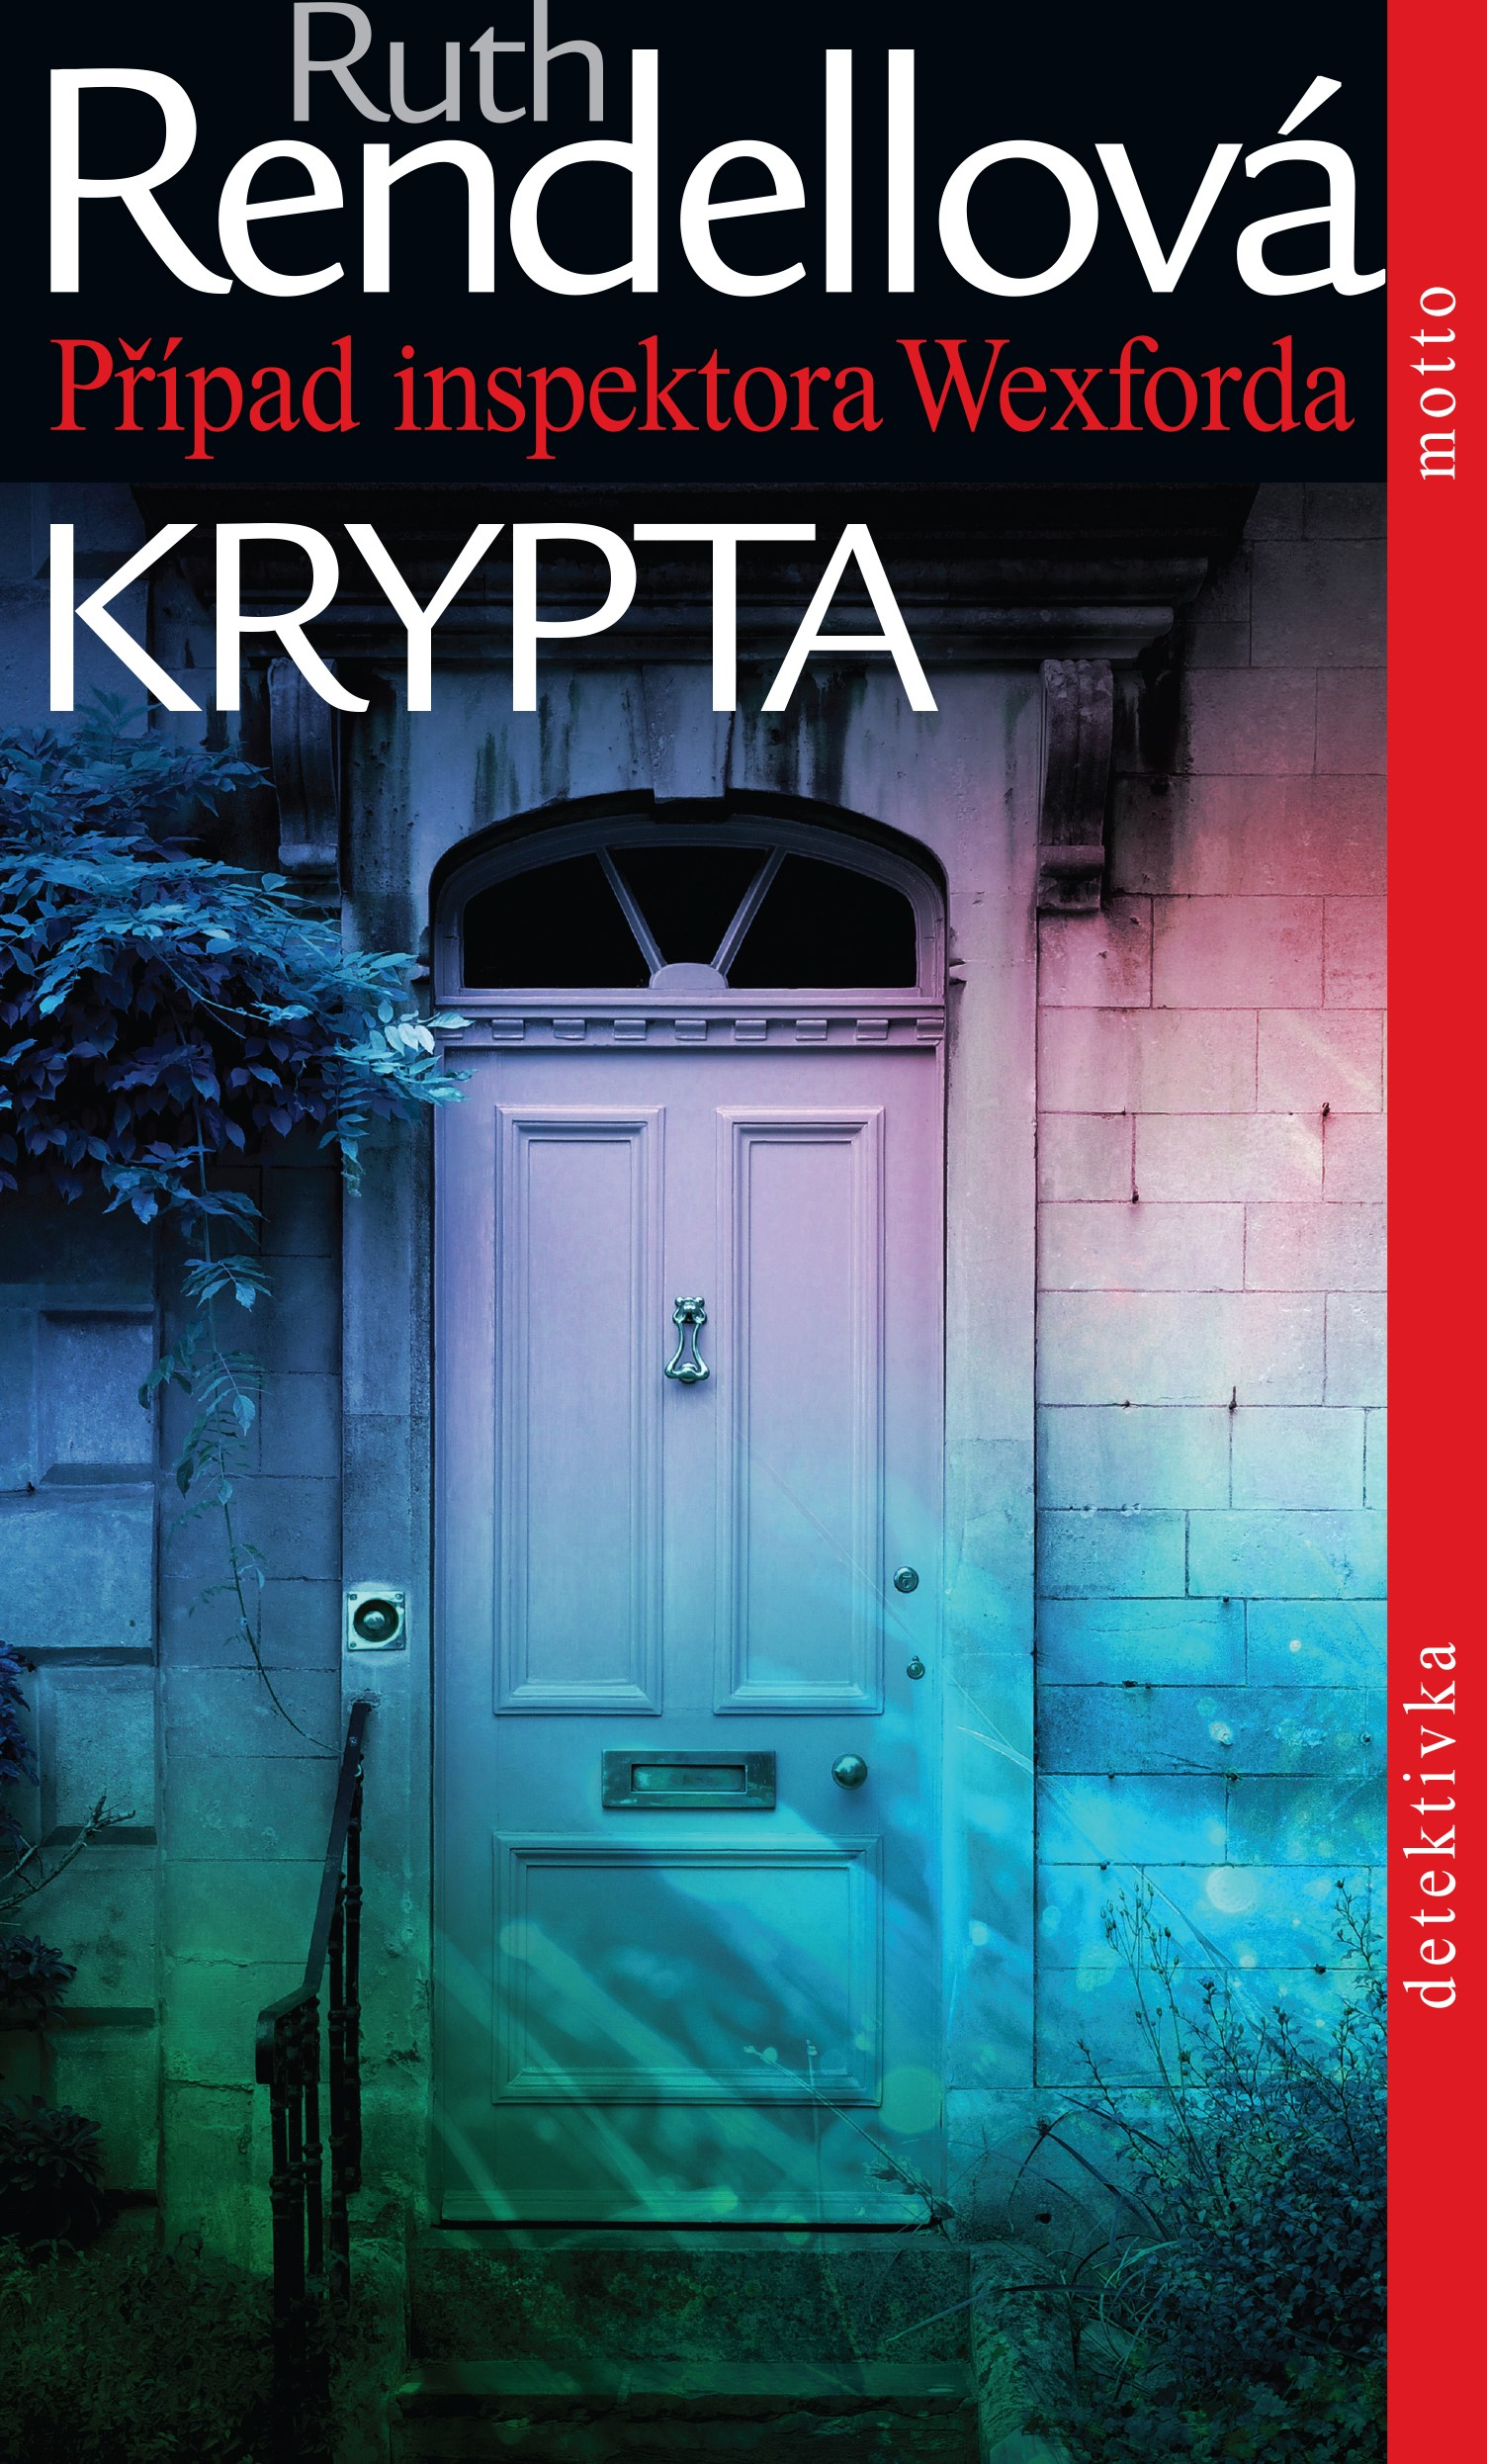 MOTTO Krypta | Ruth Rendellová